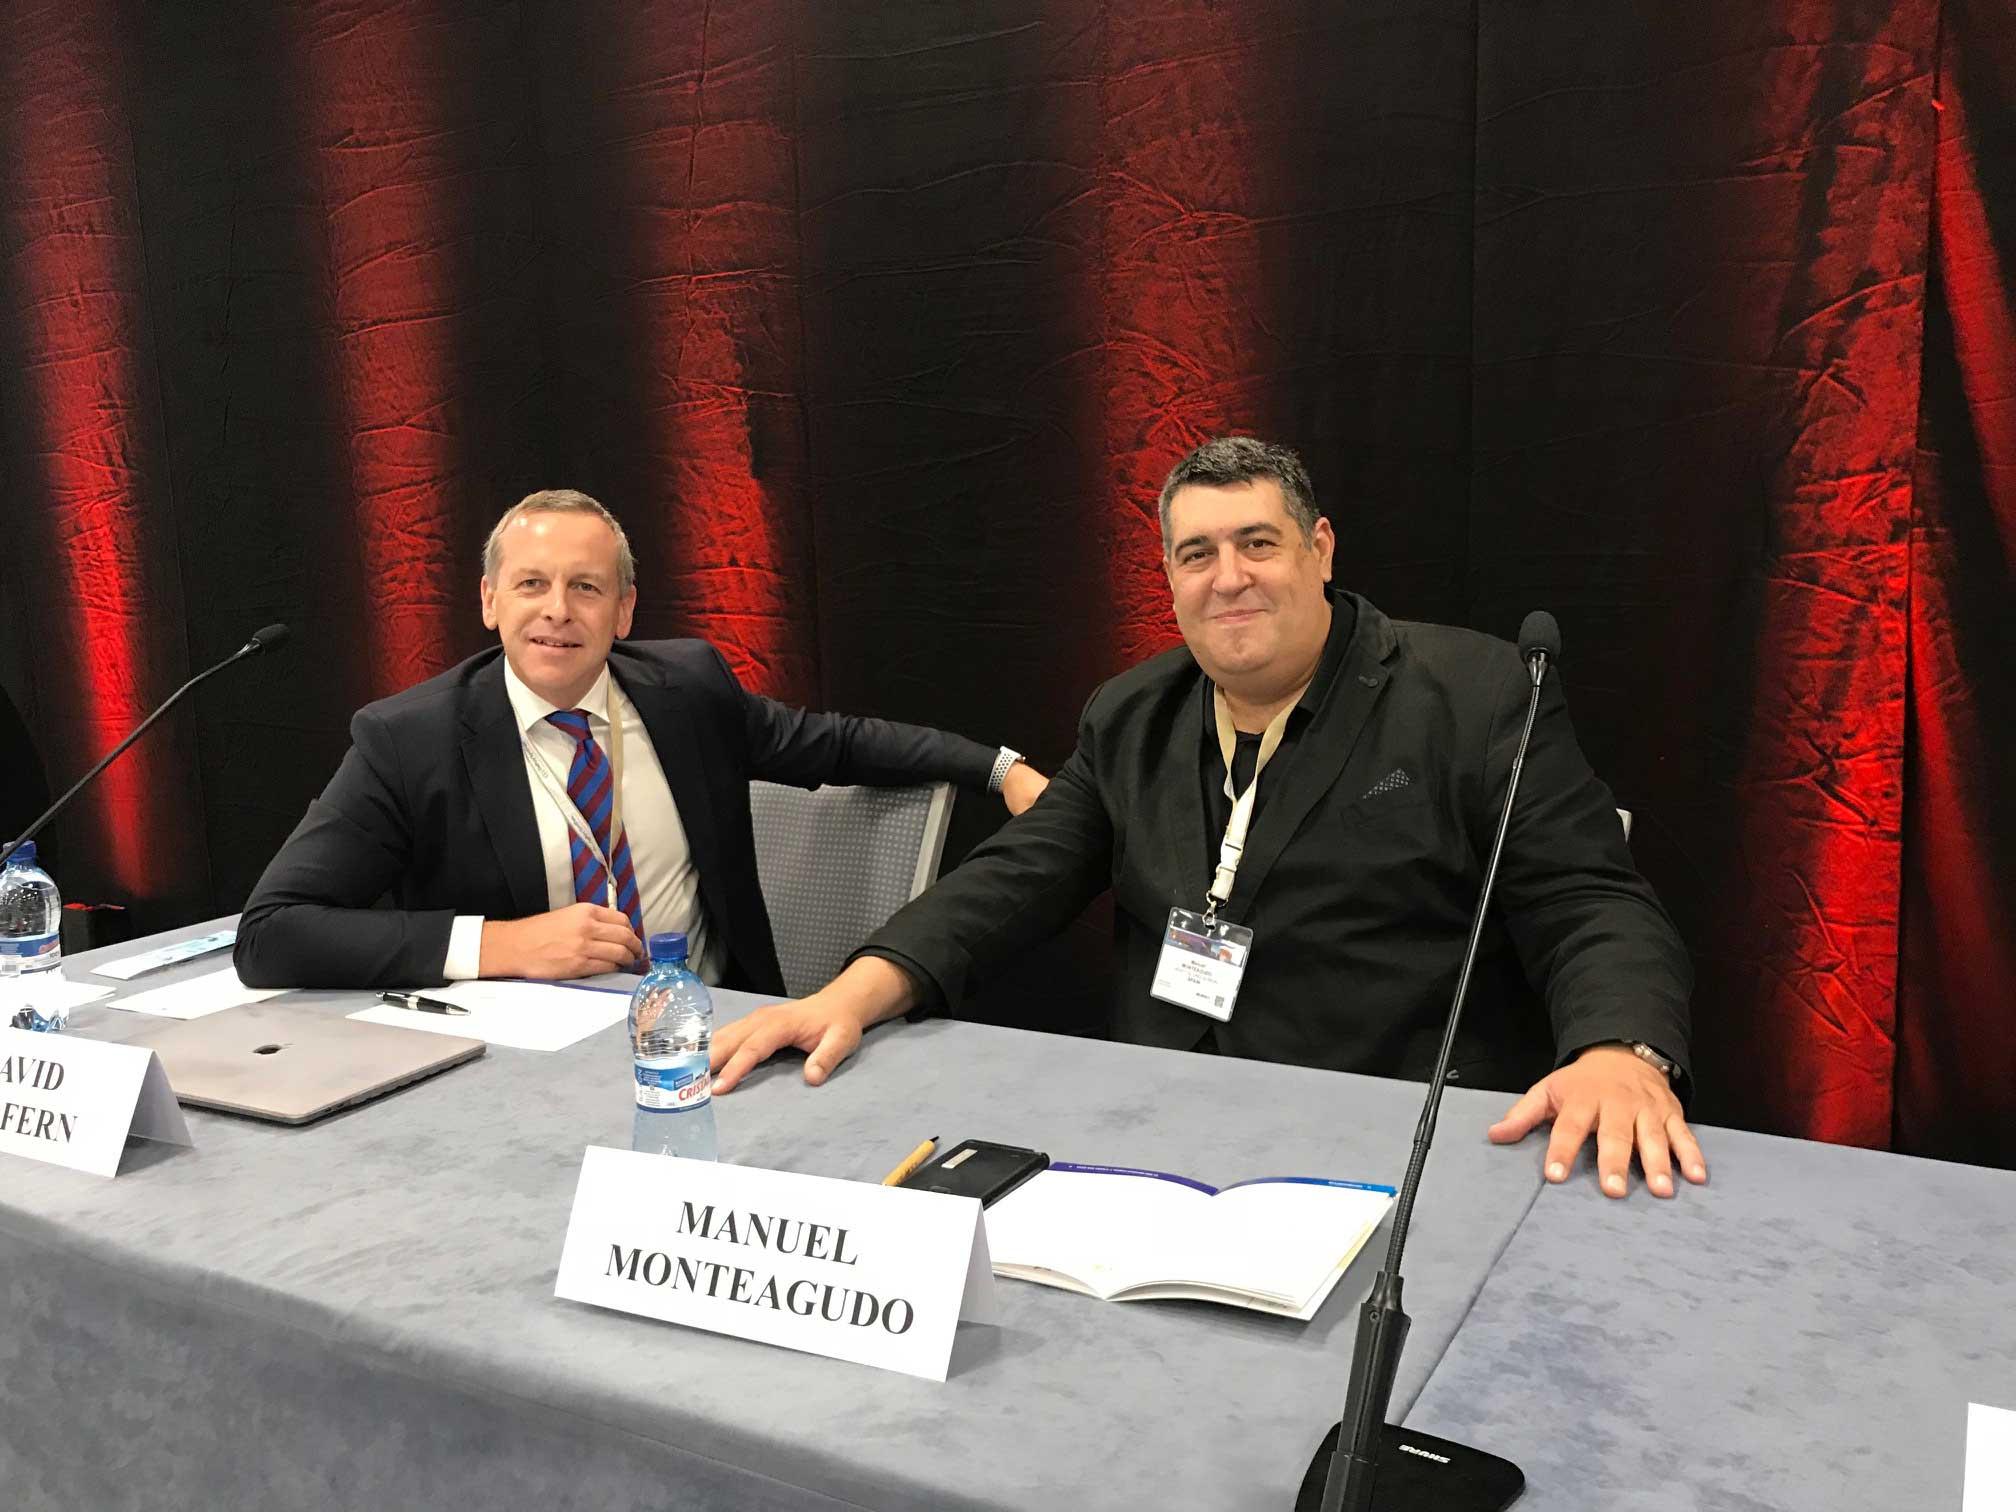 David-Redfern-Geneva-conference-2018n